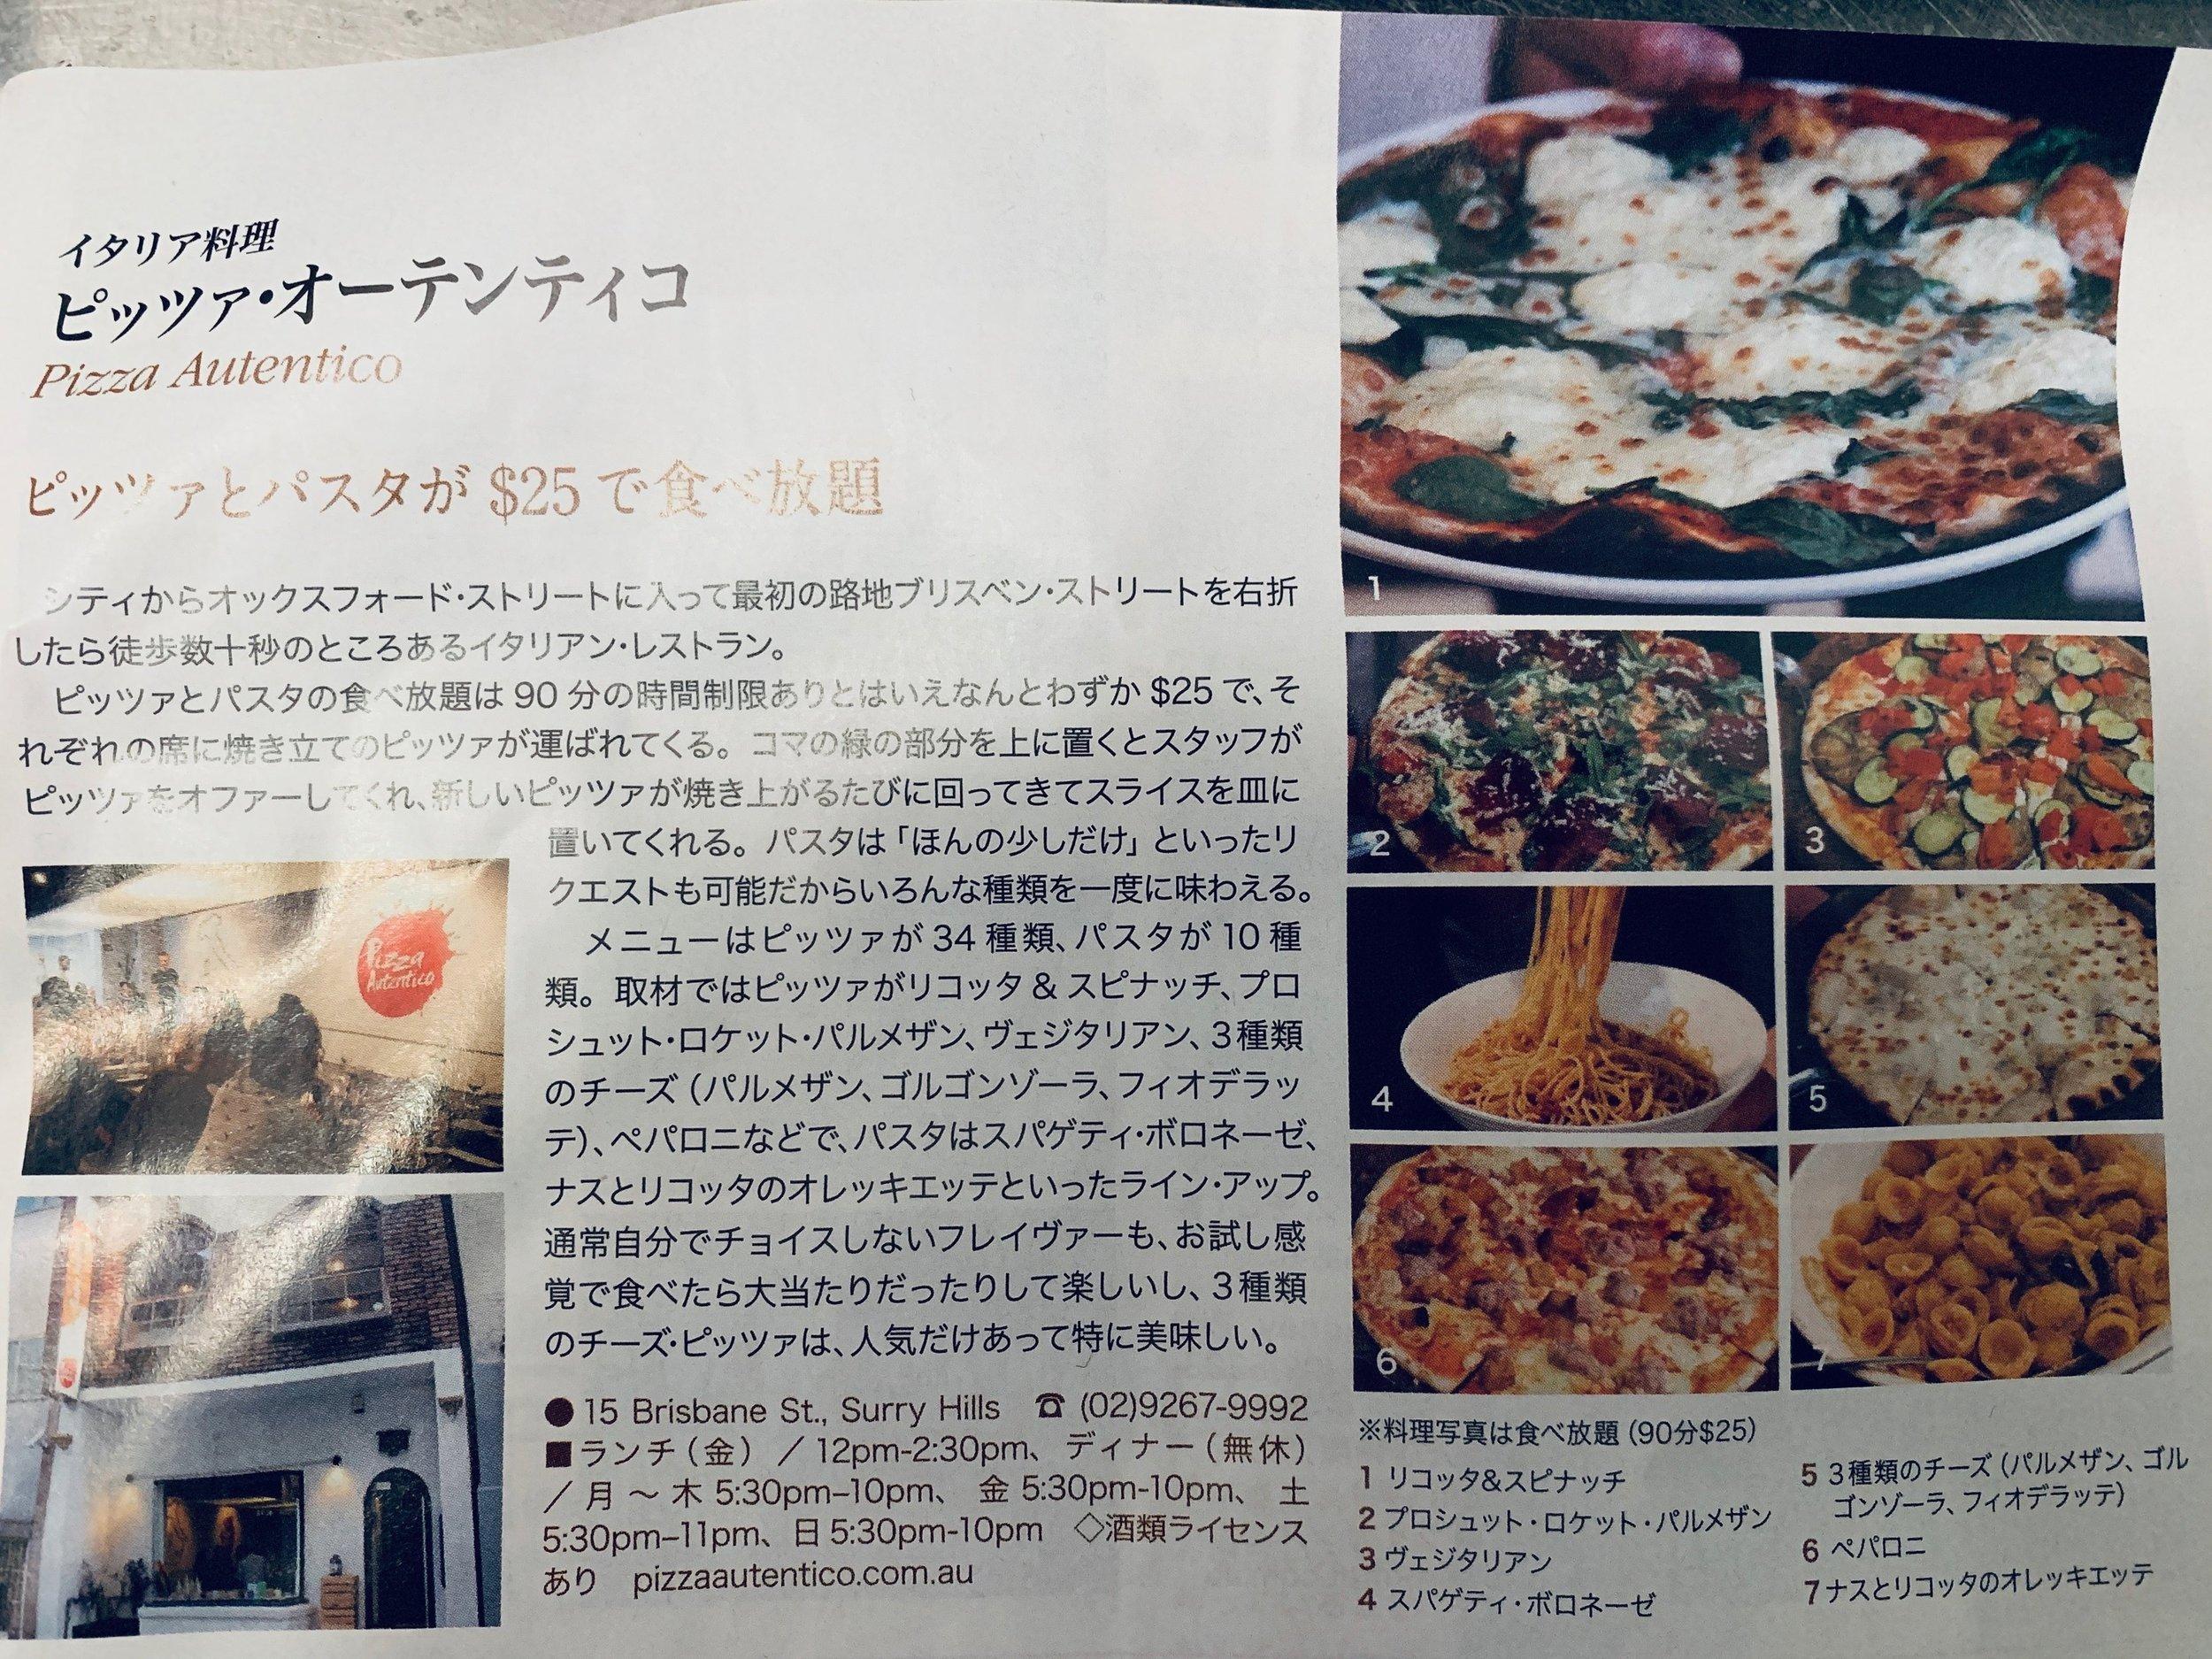 Japaralia: Jan 2018 - Japanese Magazine…